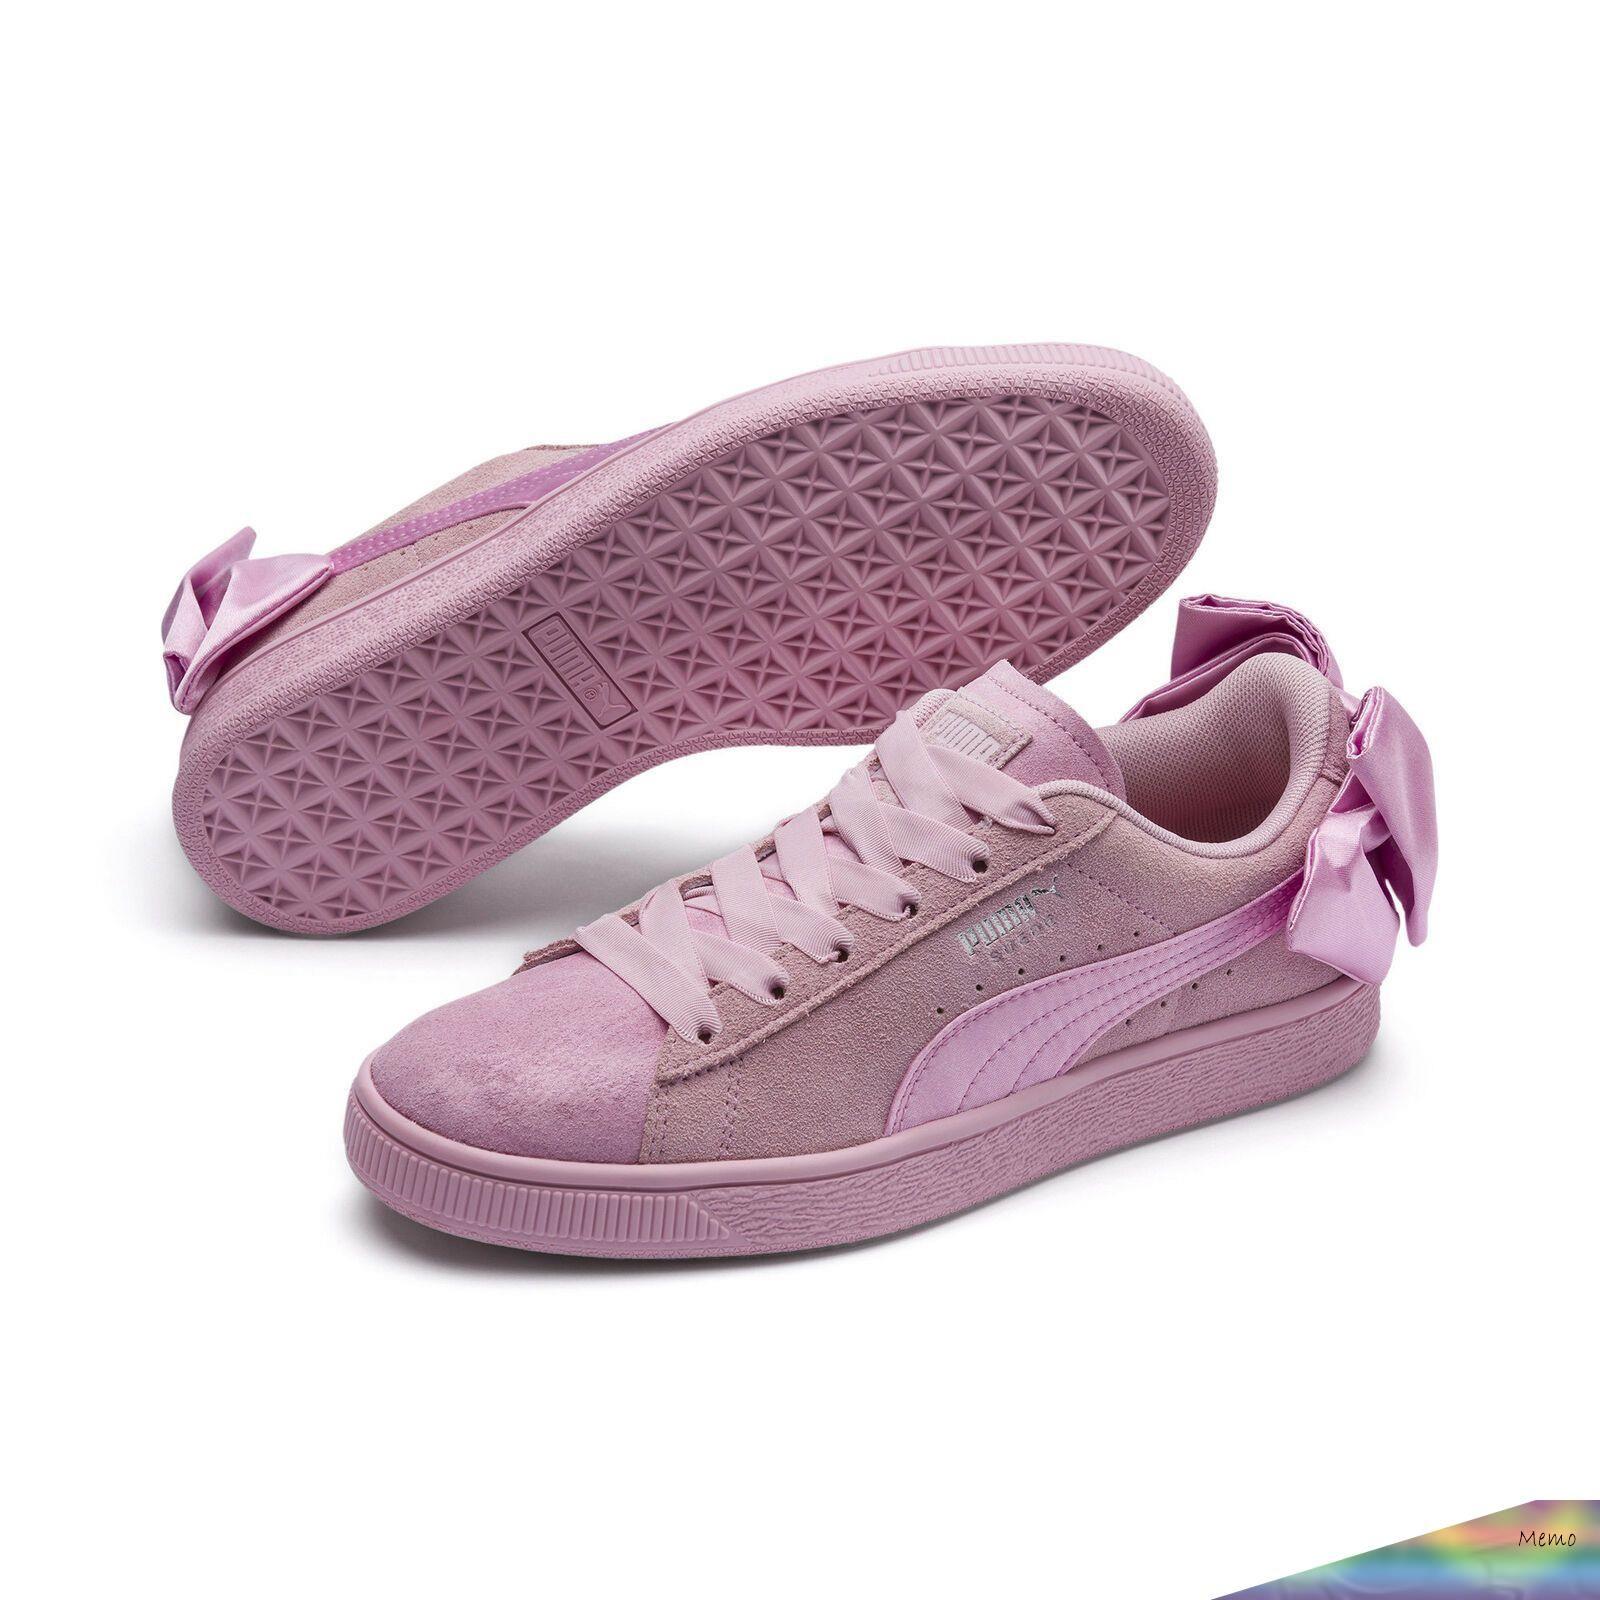 32++ New puma shoes womens ideas info